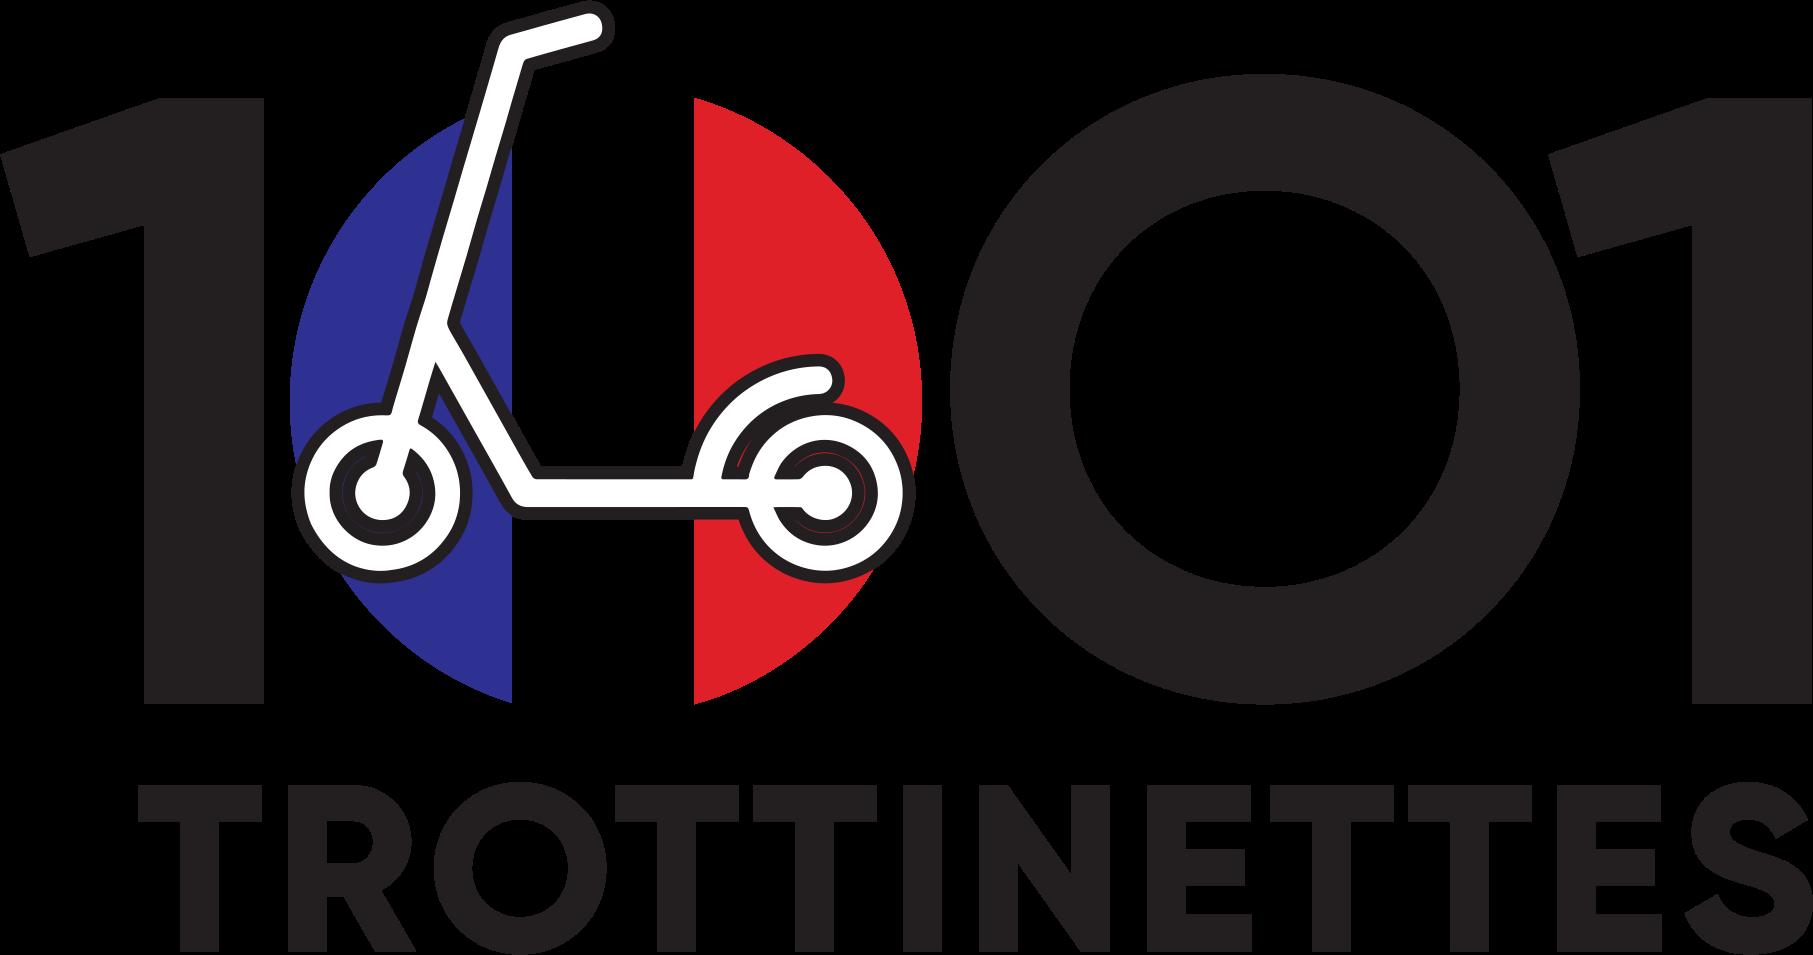 1001trottinettes.fr